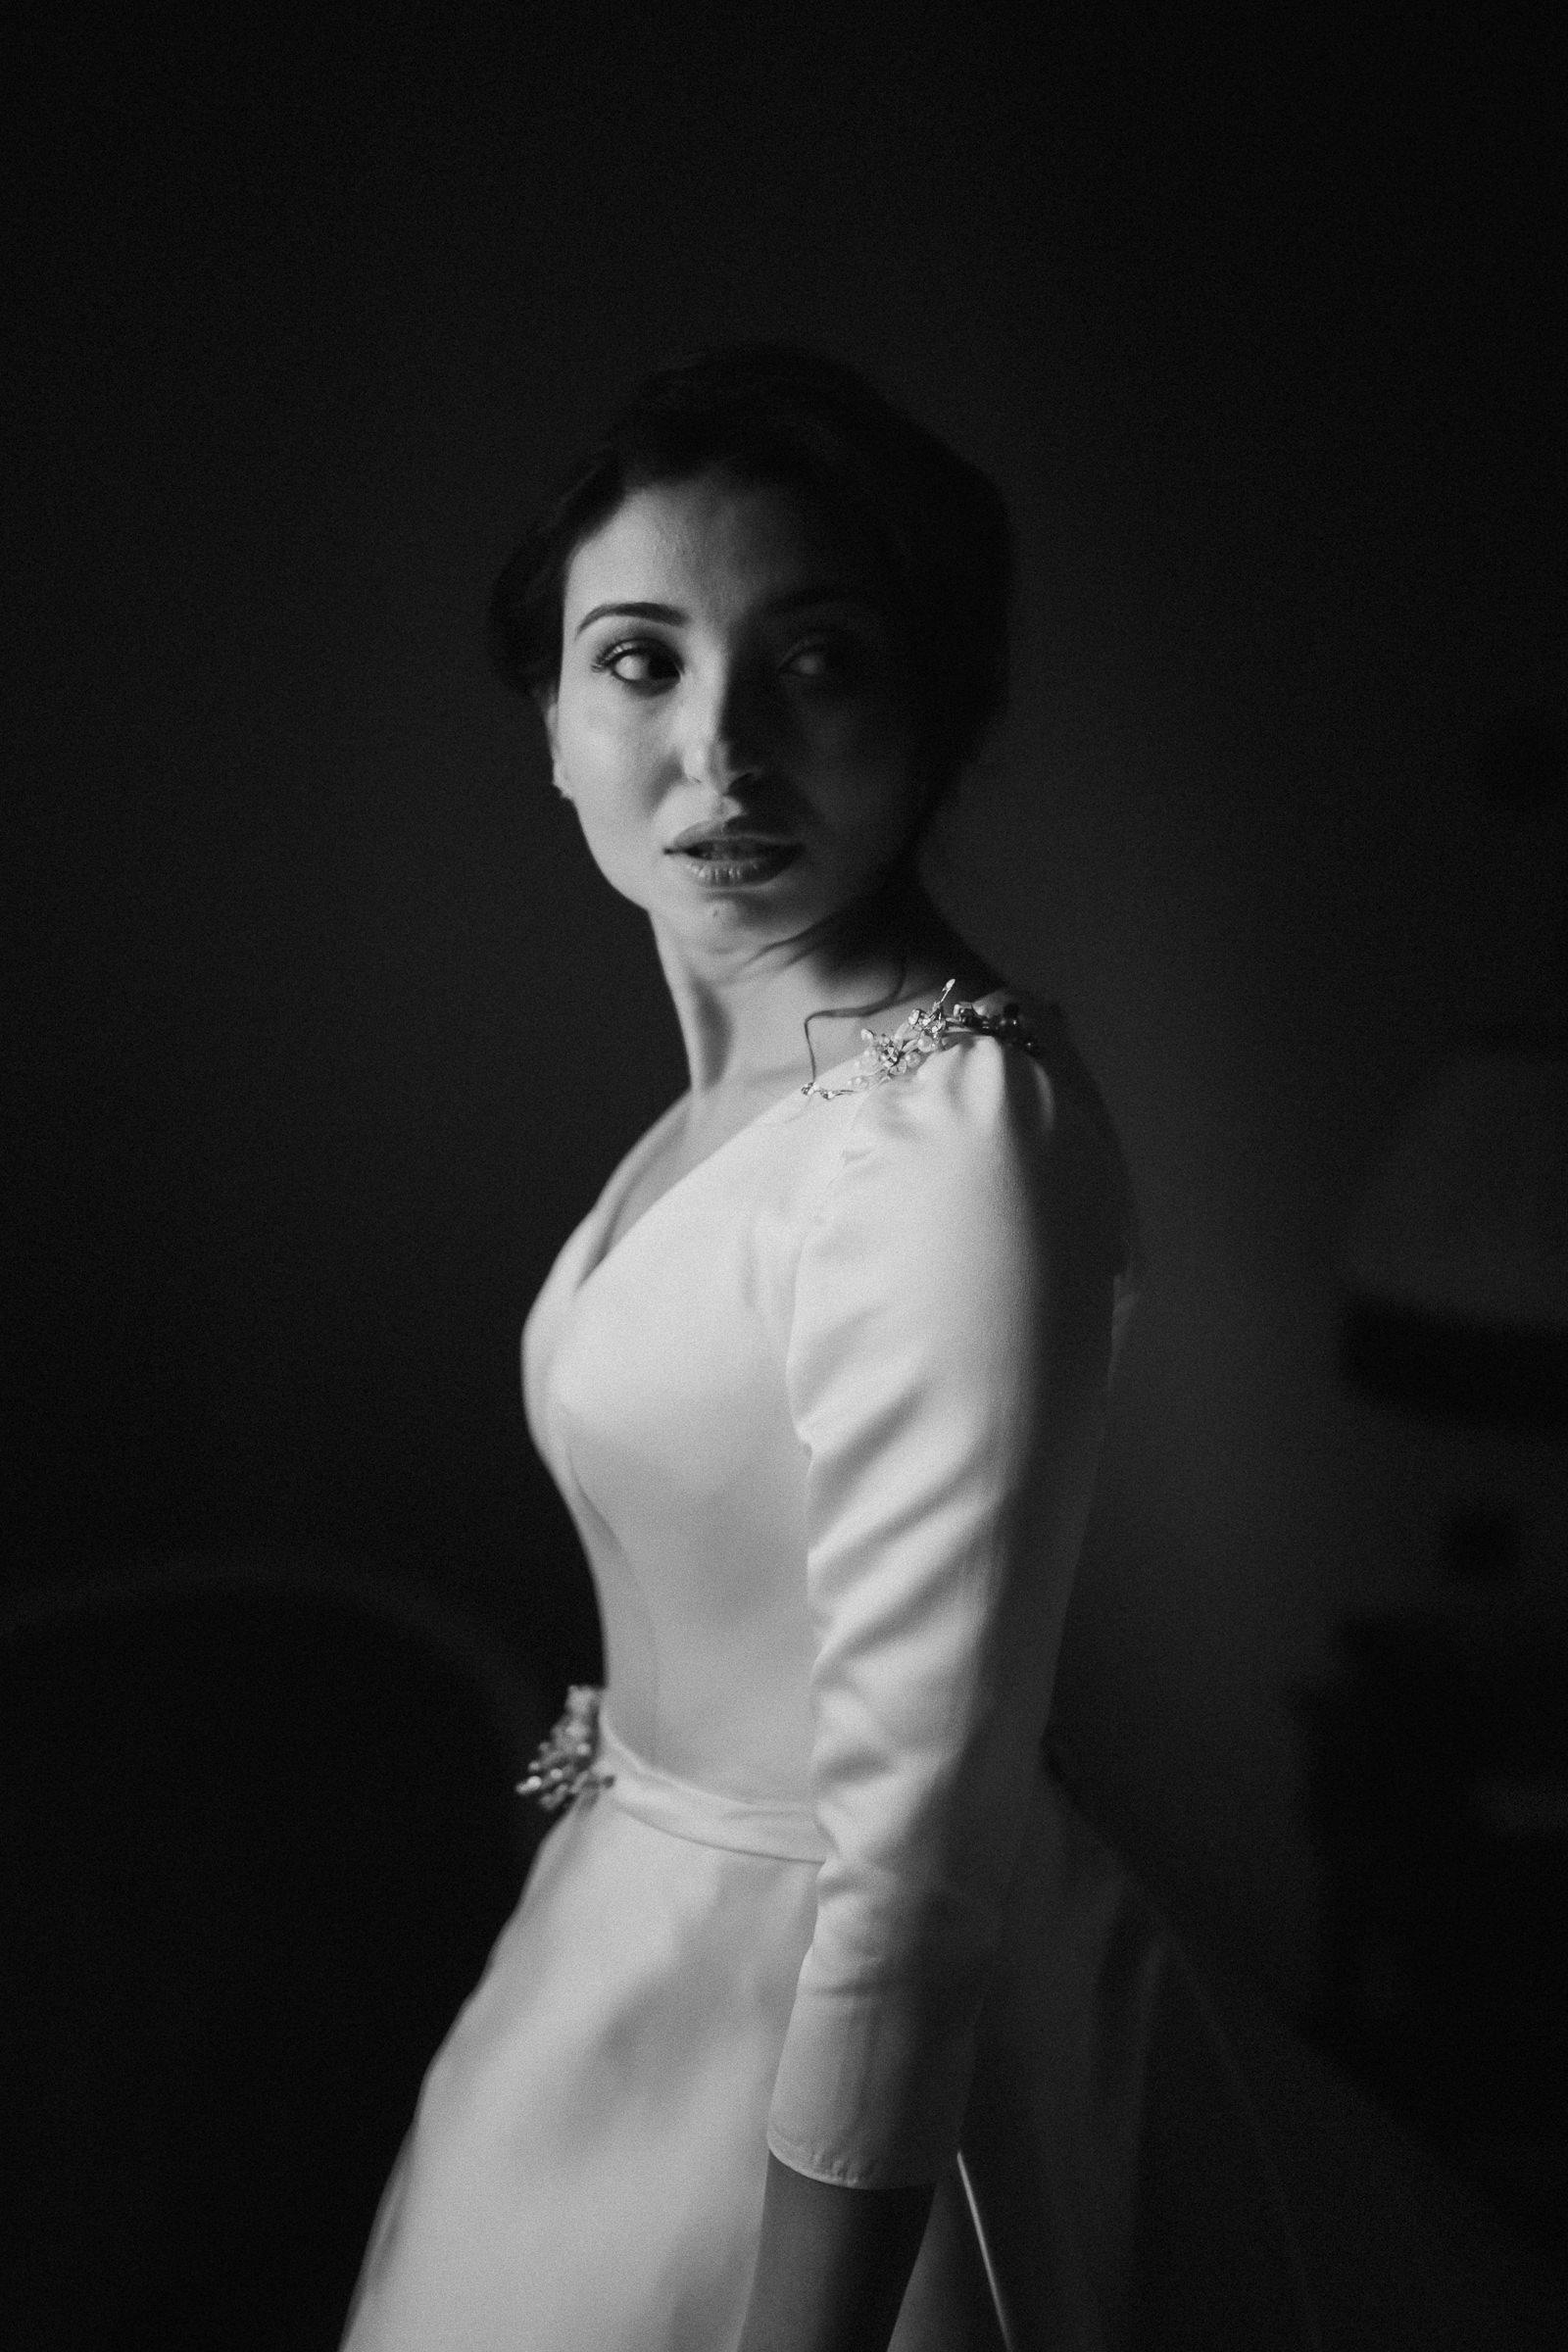 Elegant bride portrait - photo by Naomi van der Kraan